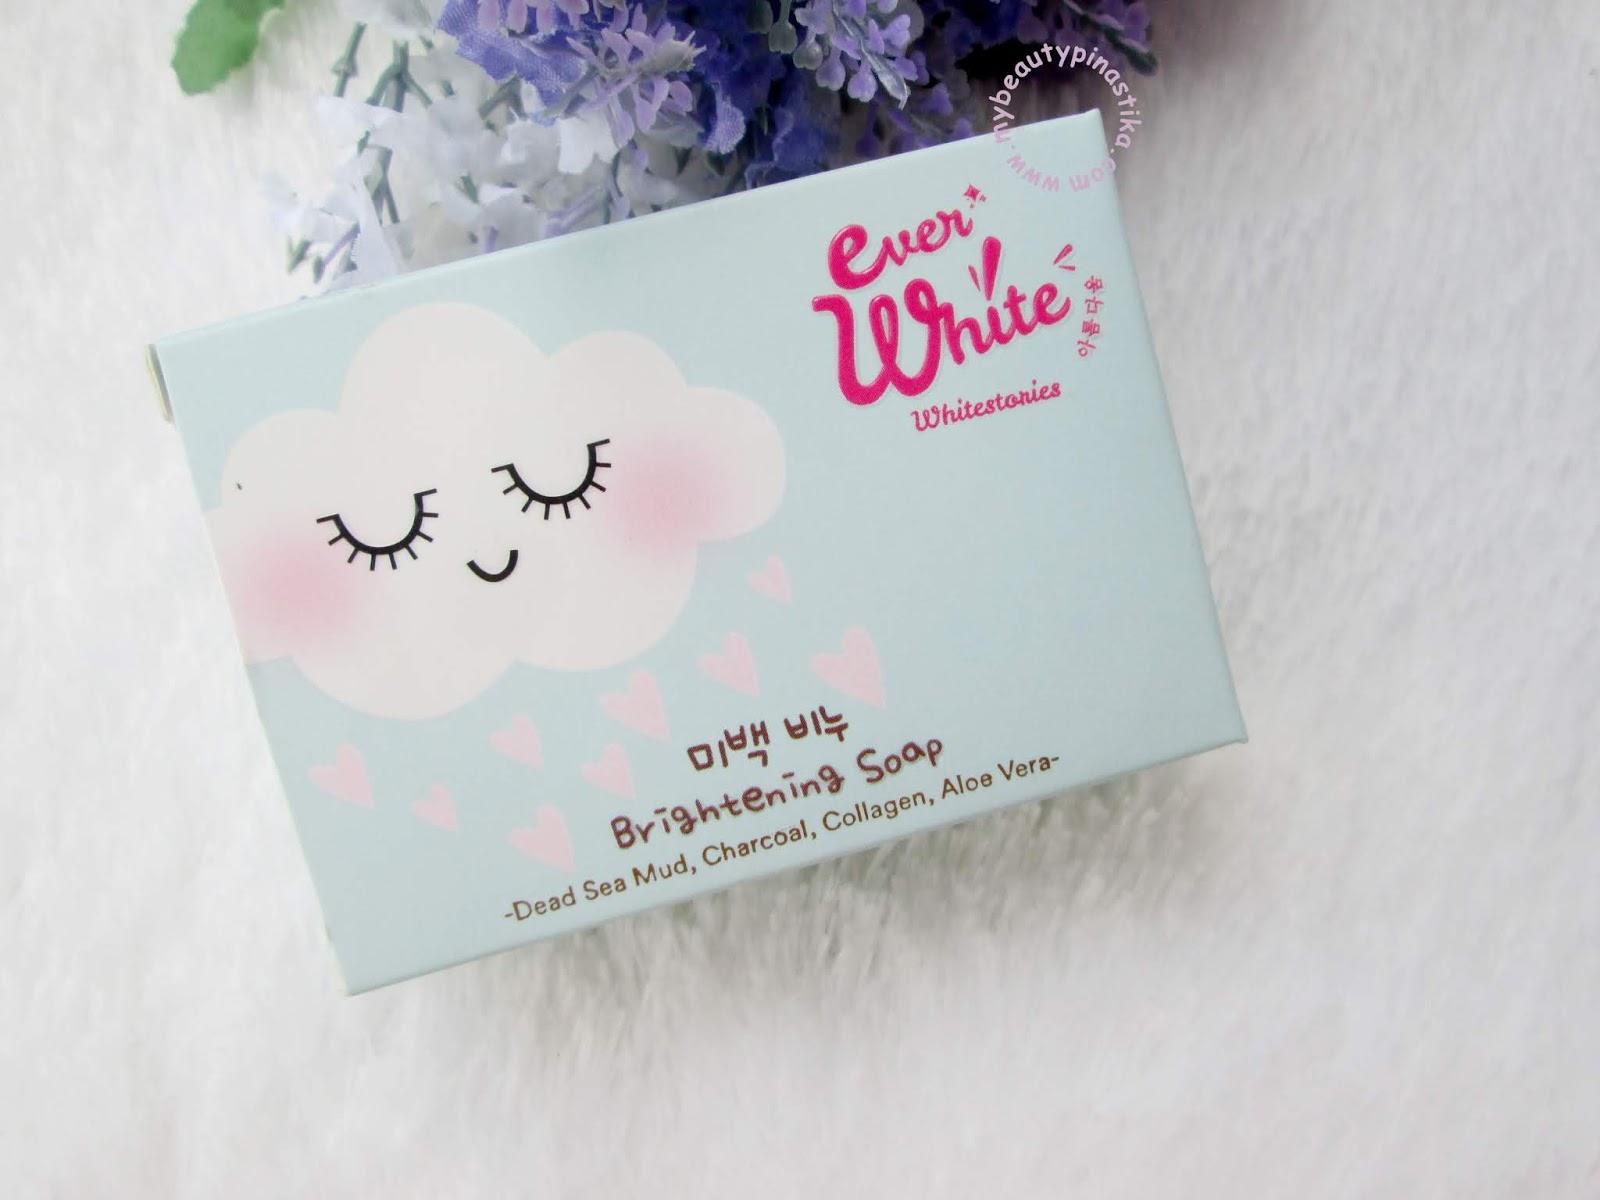 Pinastika Beauty Blog Everwhite Brightening Soap Sabun Awan Review